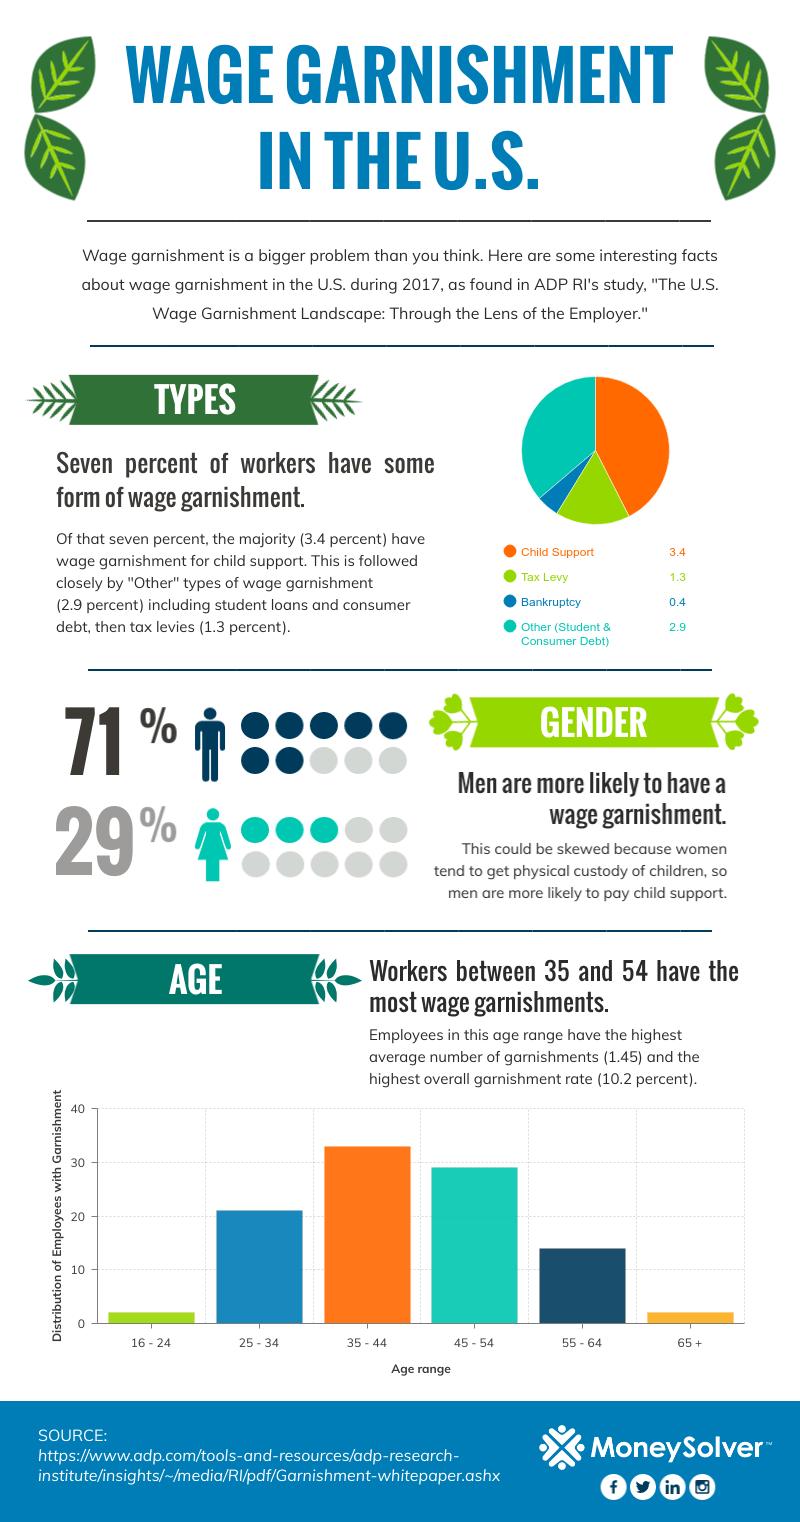 Tax Levy - IRS Wage Garnishment